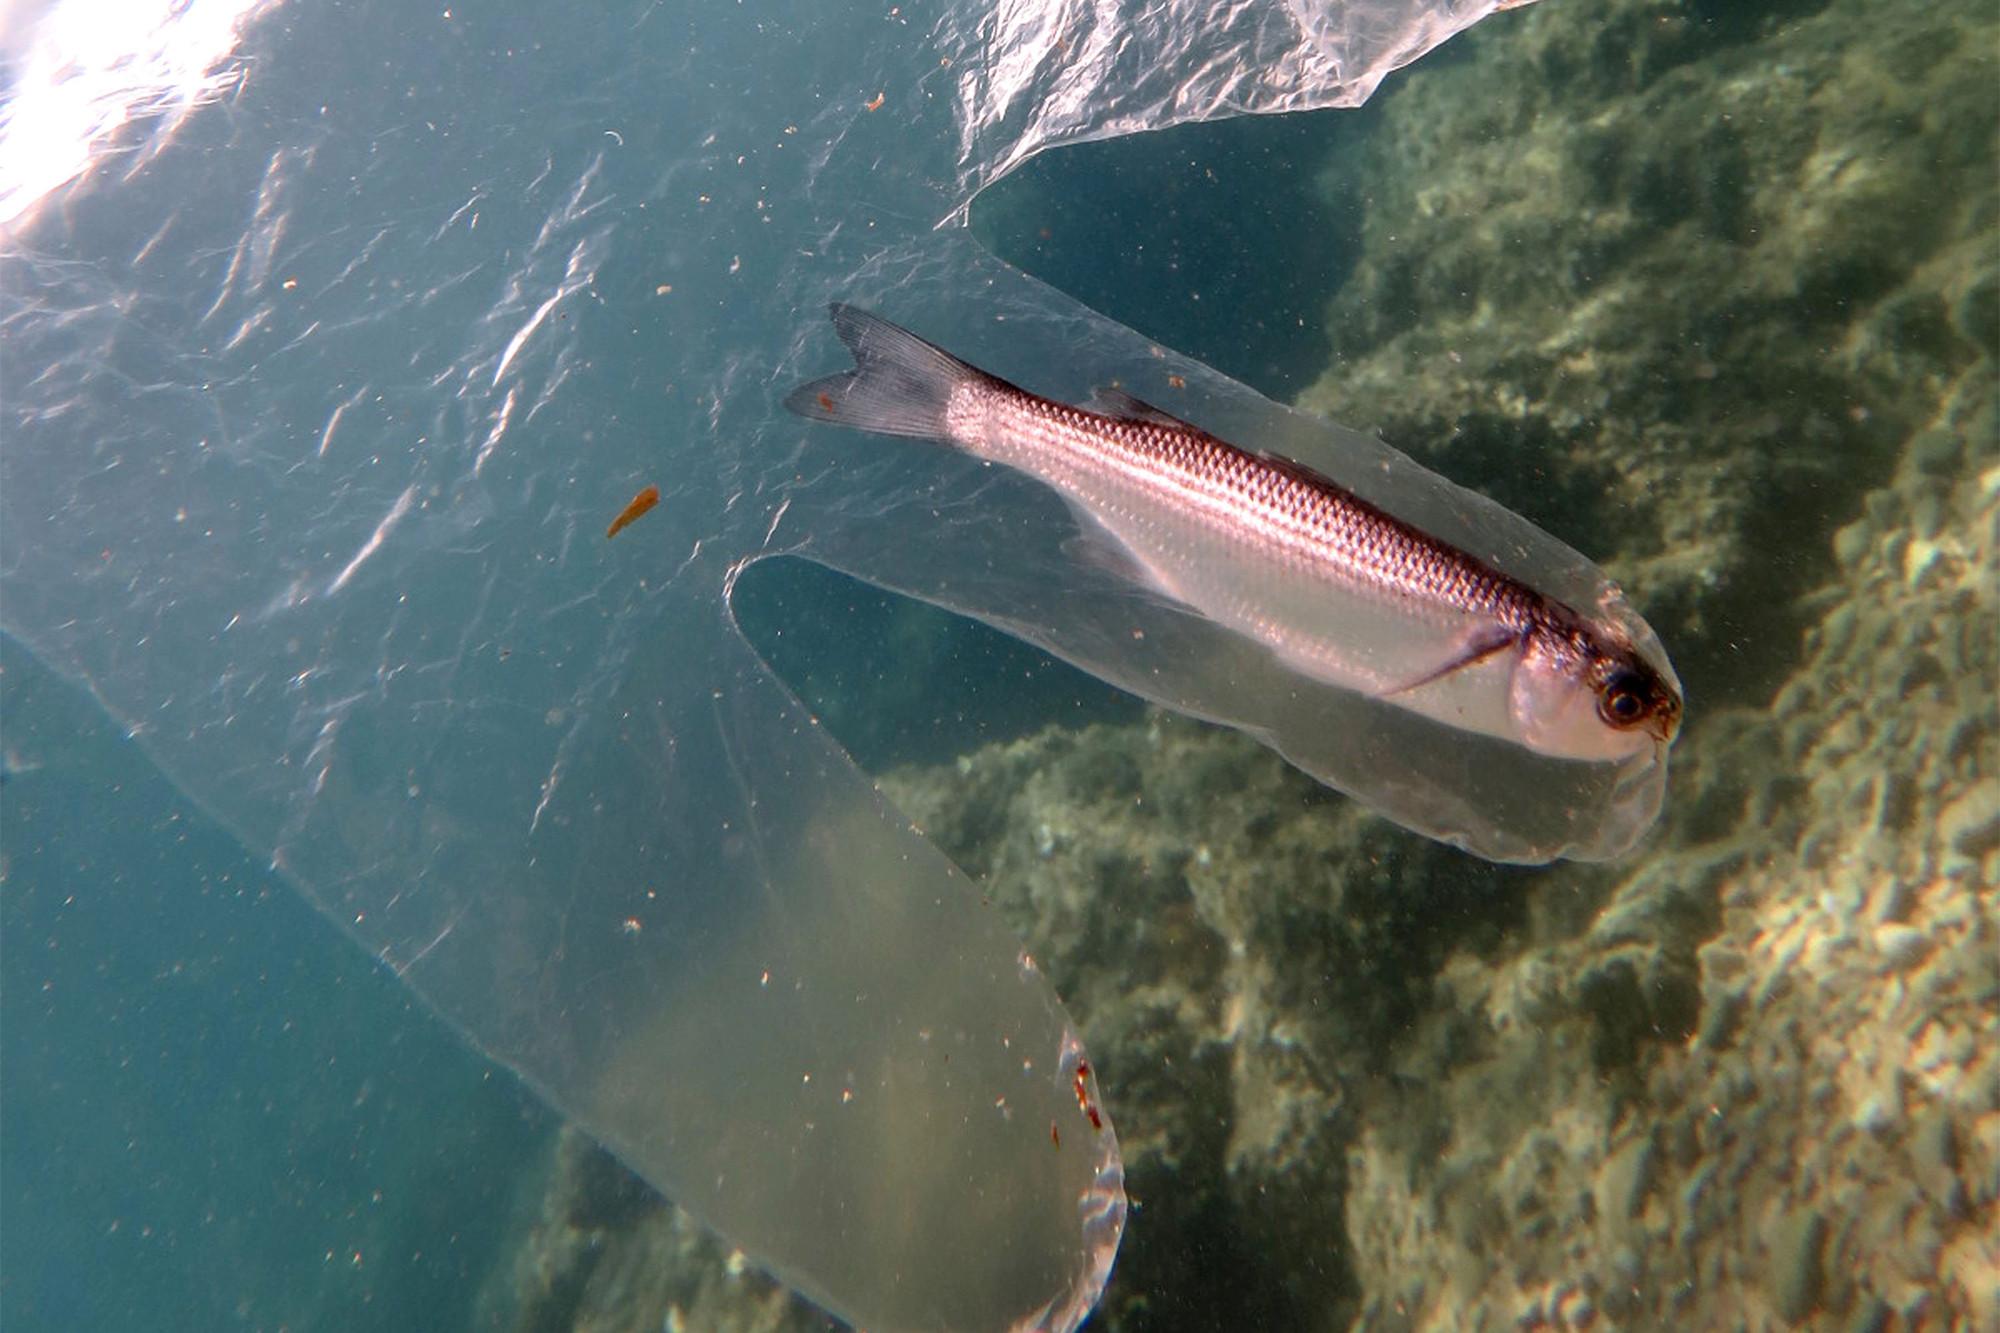 #Plastic #Glove #trapped #fish